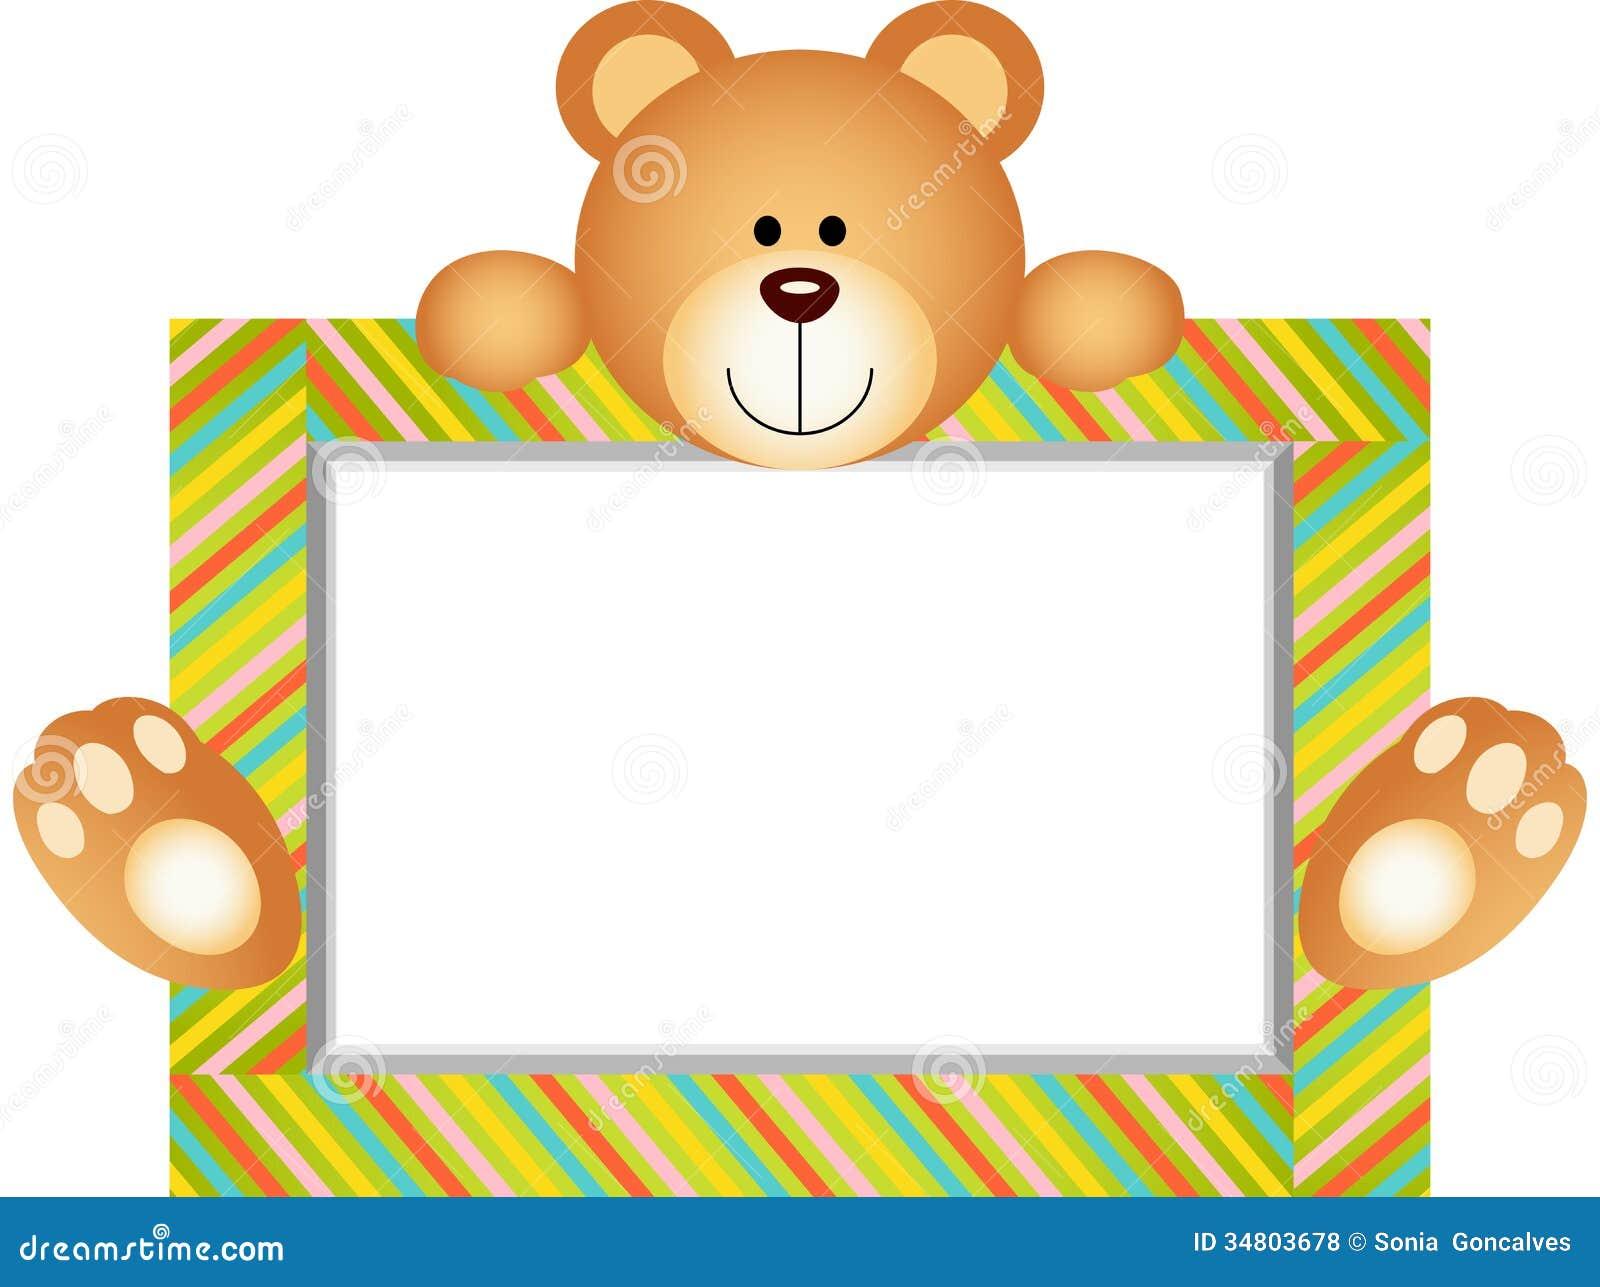 Teddy Bear With Blank Label Royalty Free Stock Photos